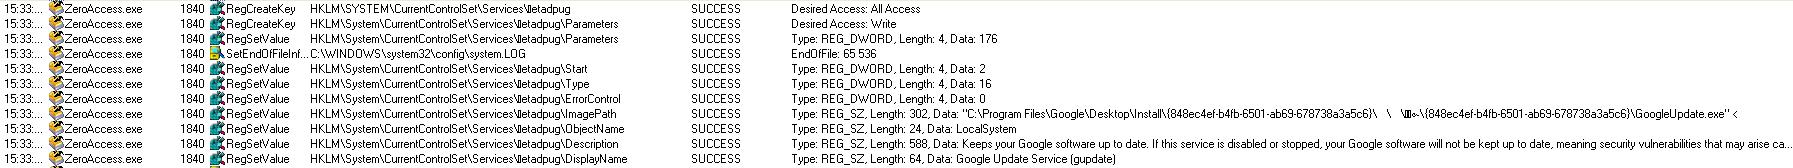 ProcMon capture : ZeroAccess creating its service key